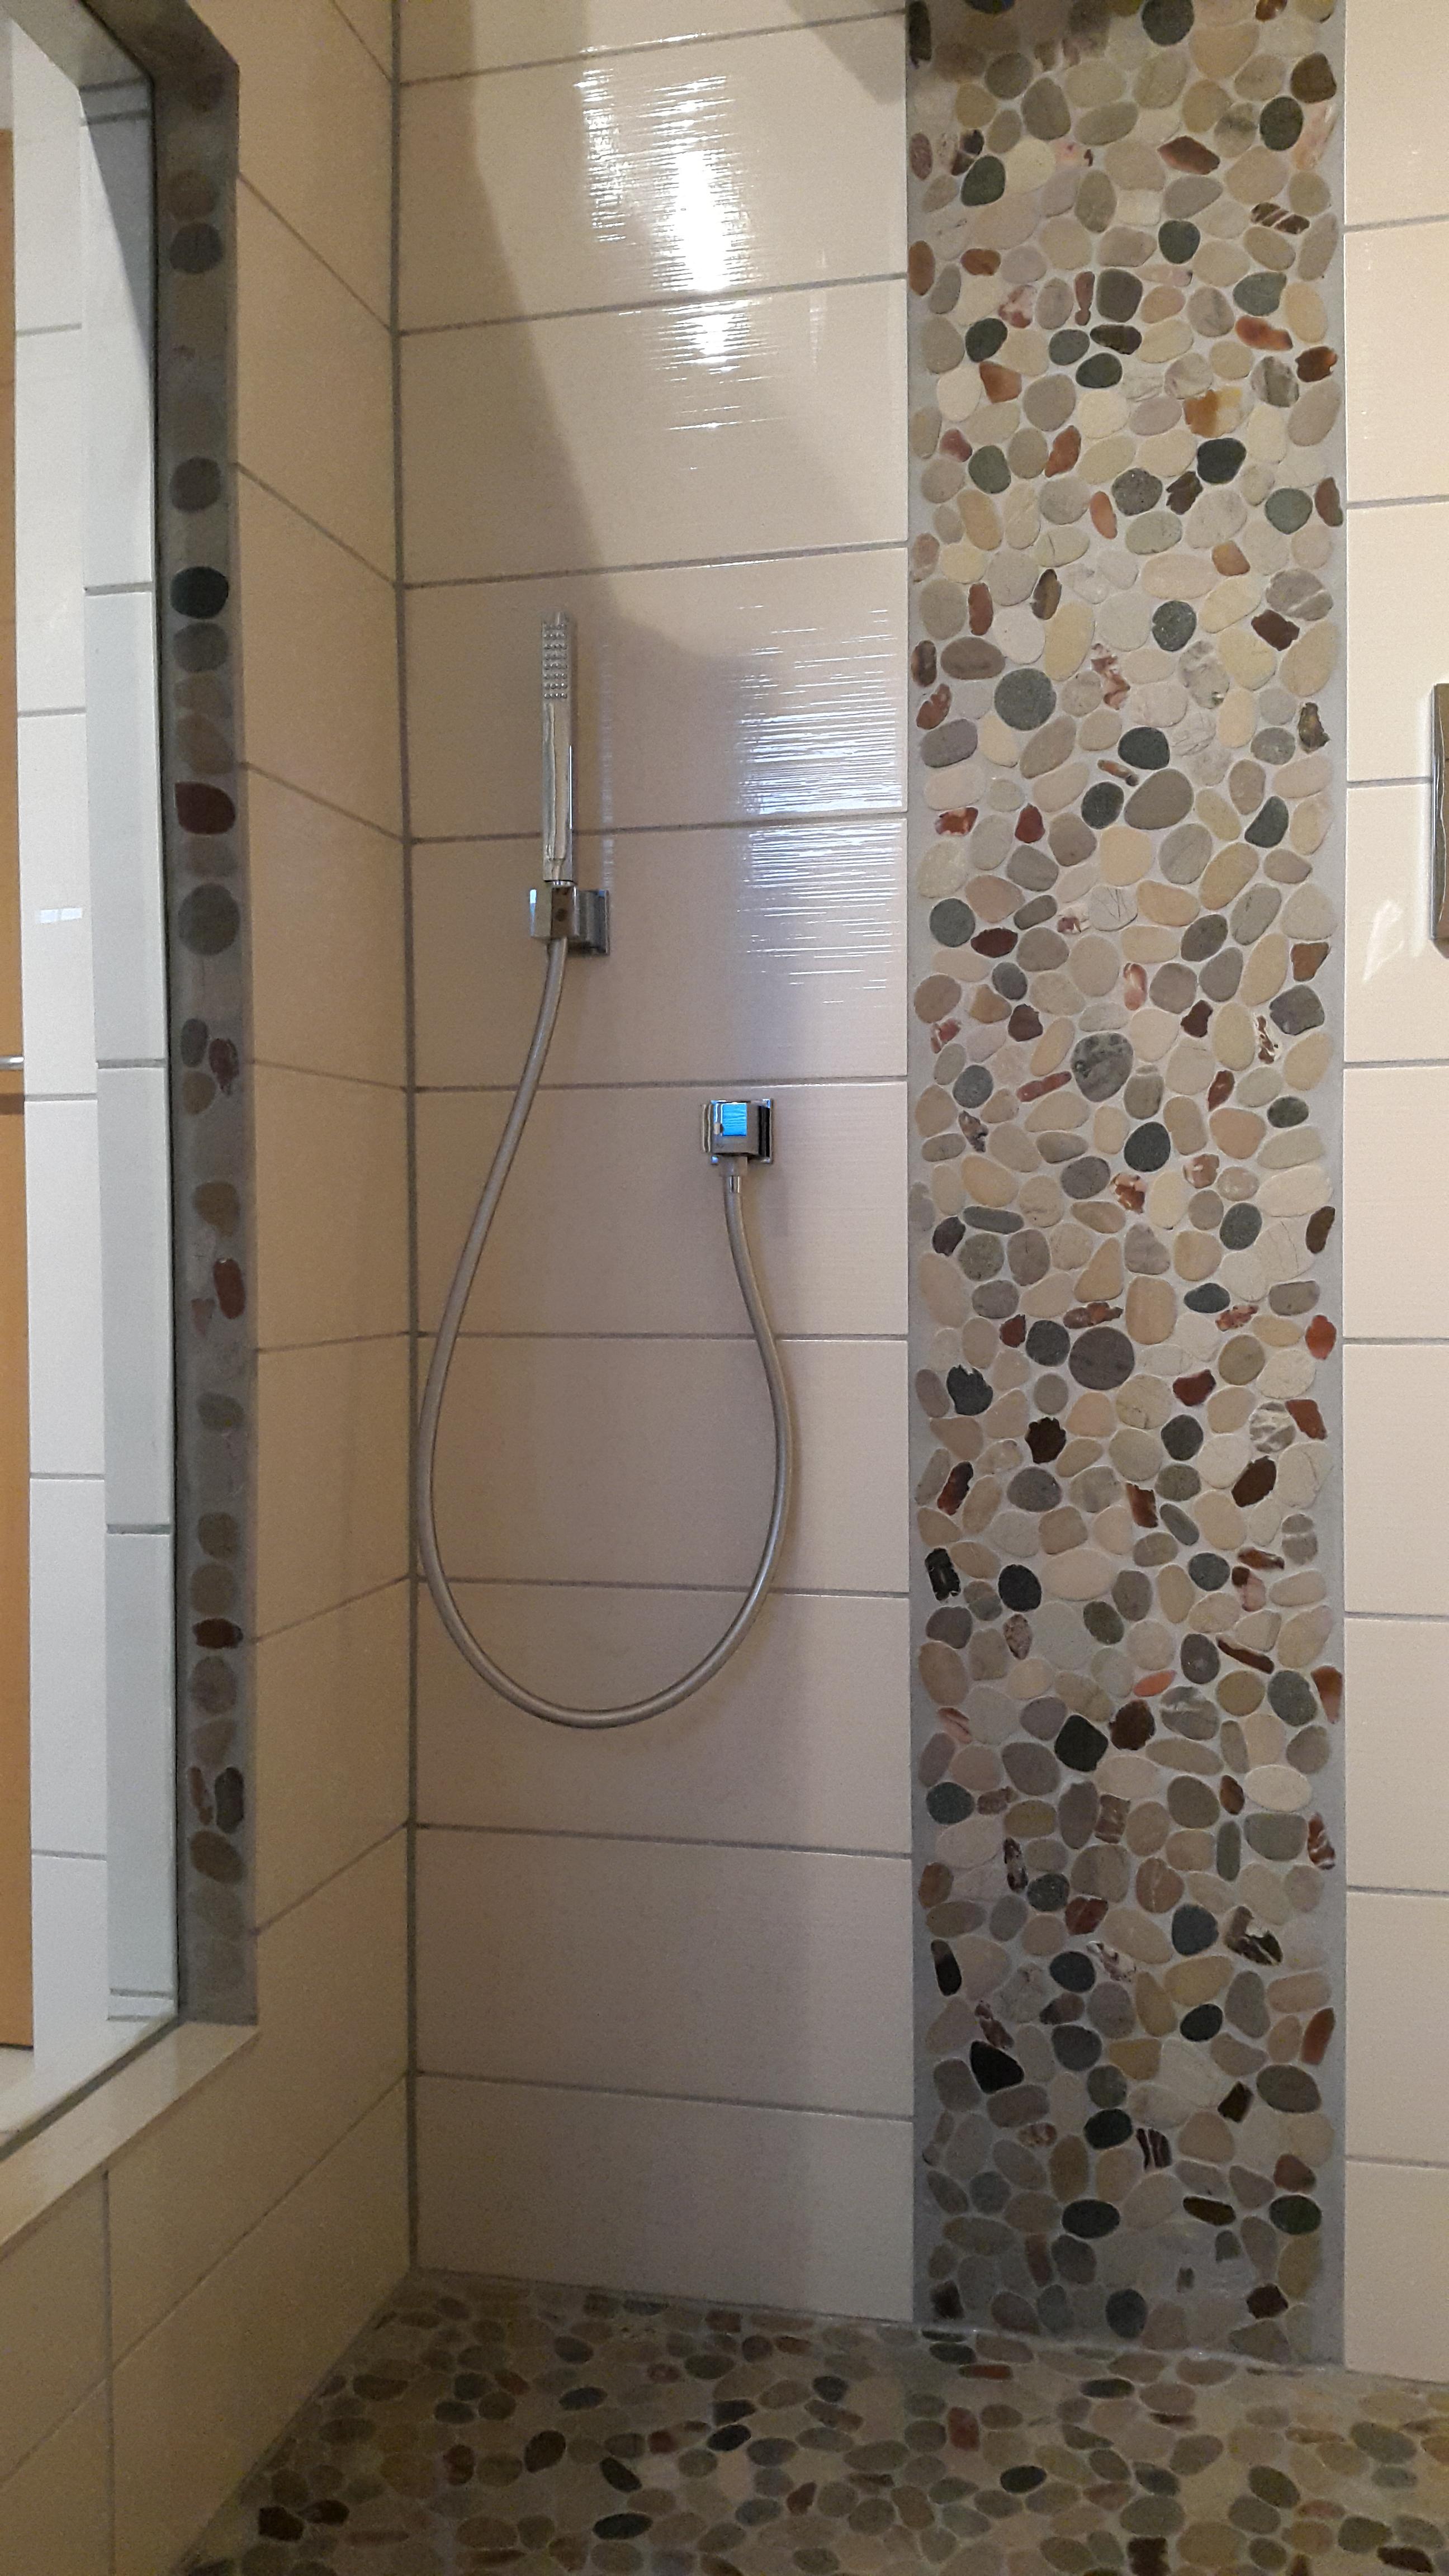 mosaik fliesen dusche fliesen mosaik dusche fliesen mosaik dusche dusche mit bodenablauf. Black Bedroom Furniture Sets. Home Design Ideas